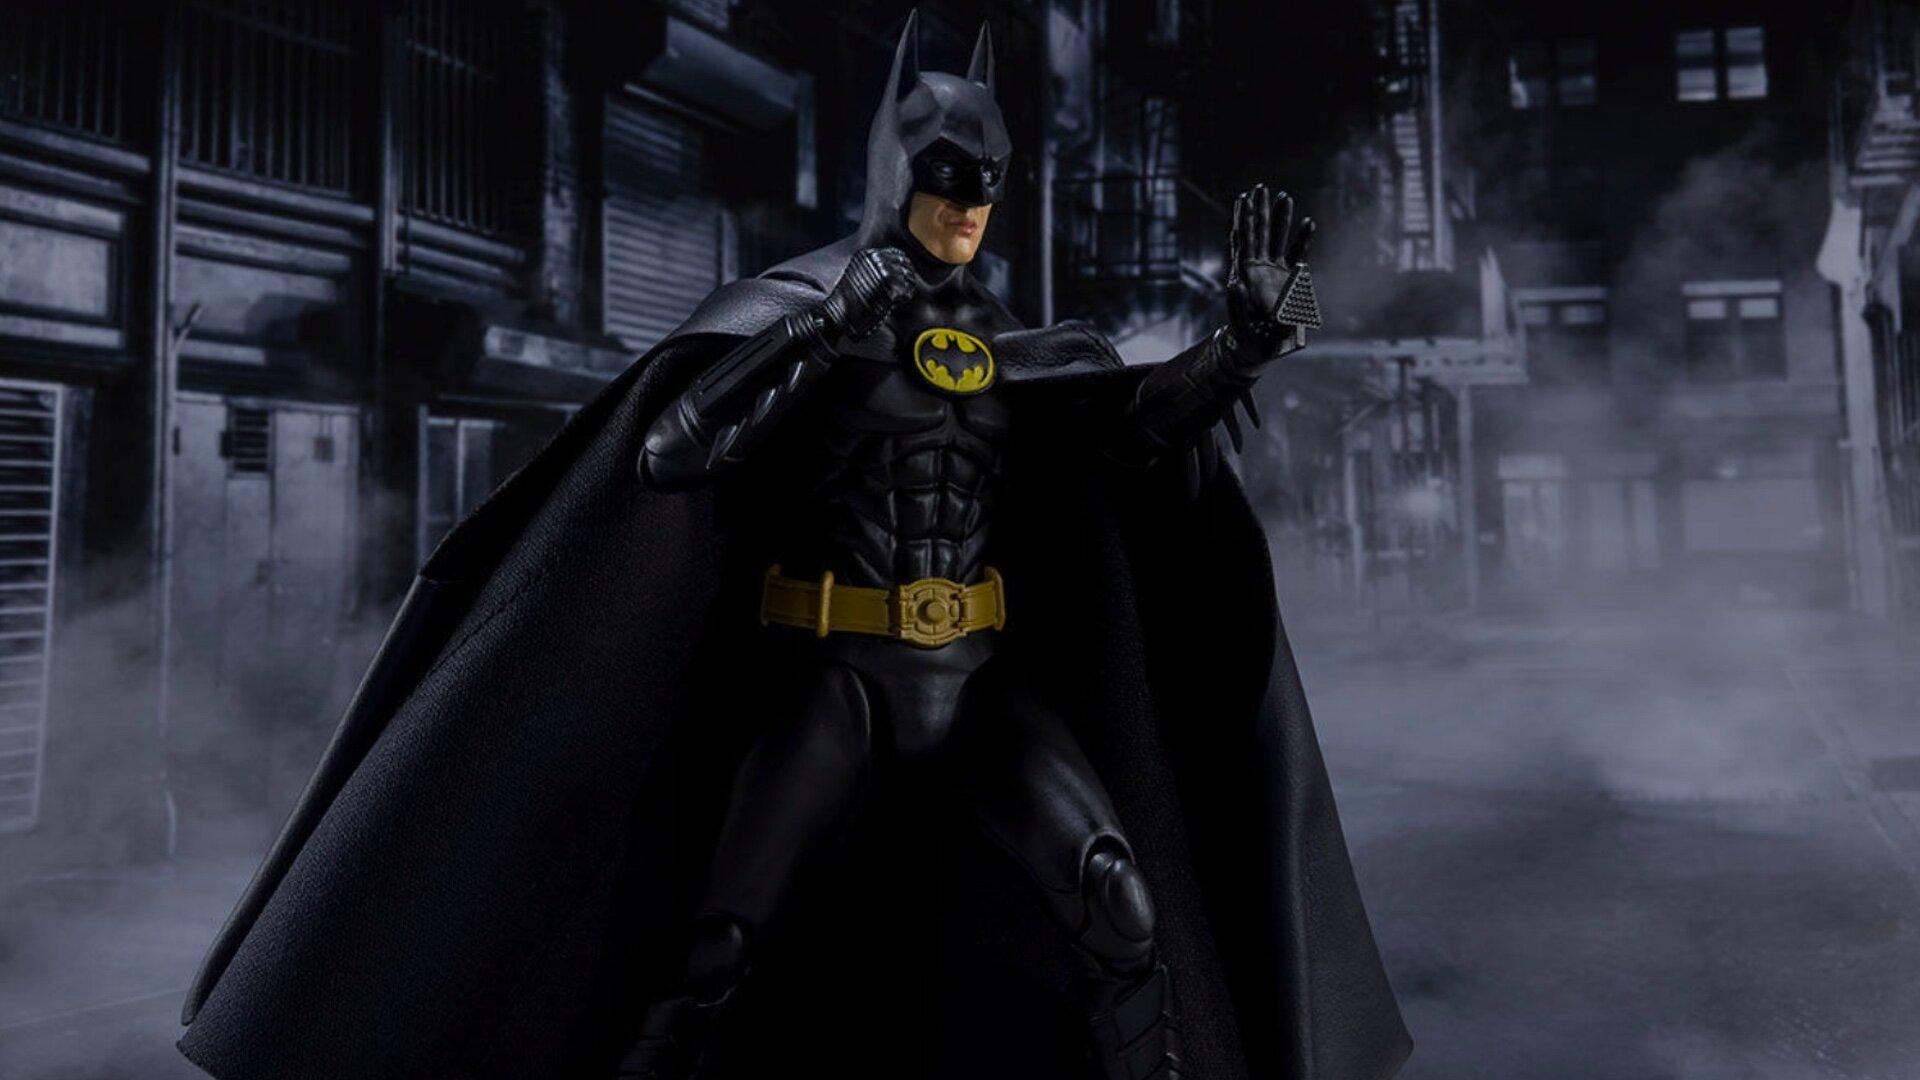 Impressively Cool Action Figure For Michael Keaton S 1989 Batman Geektyrant